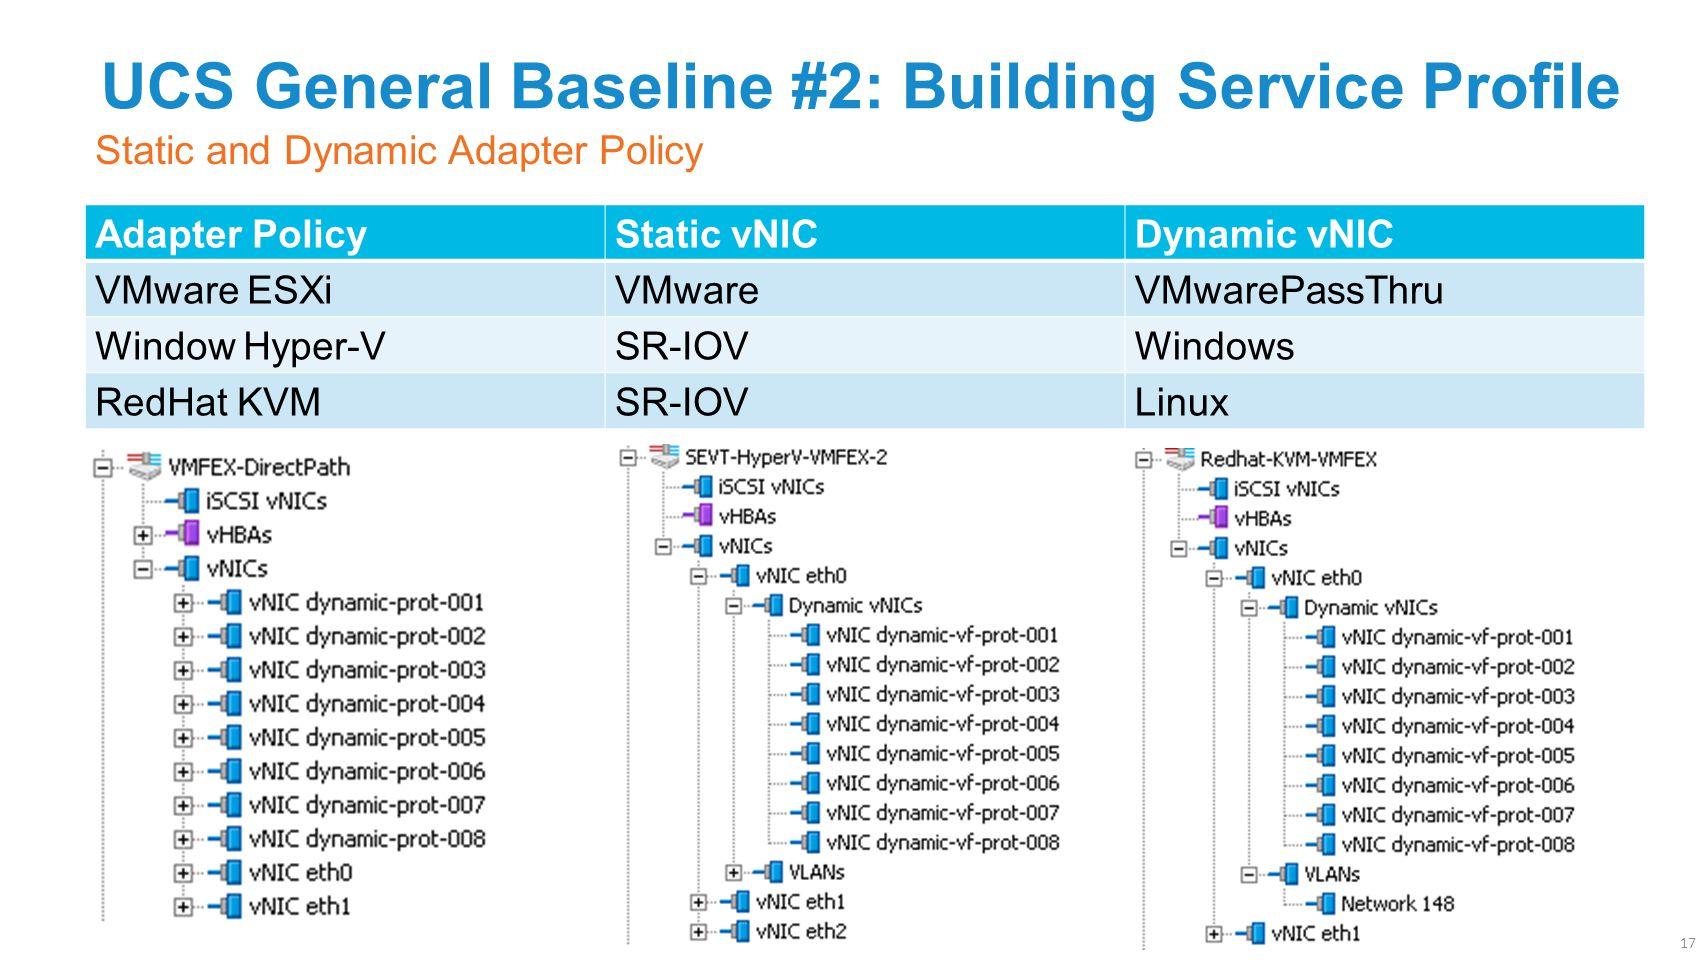 UCS General Baseline #2: Building Service Profile Adapter PolicyStatic vNICDynamic vNIC VMware ESXiVMwareVMwarePassThru Window Hyper-VSR-IOVWindows RedHat KVMSR-IOVLinux Static and Dynamic Adapter Policy 17